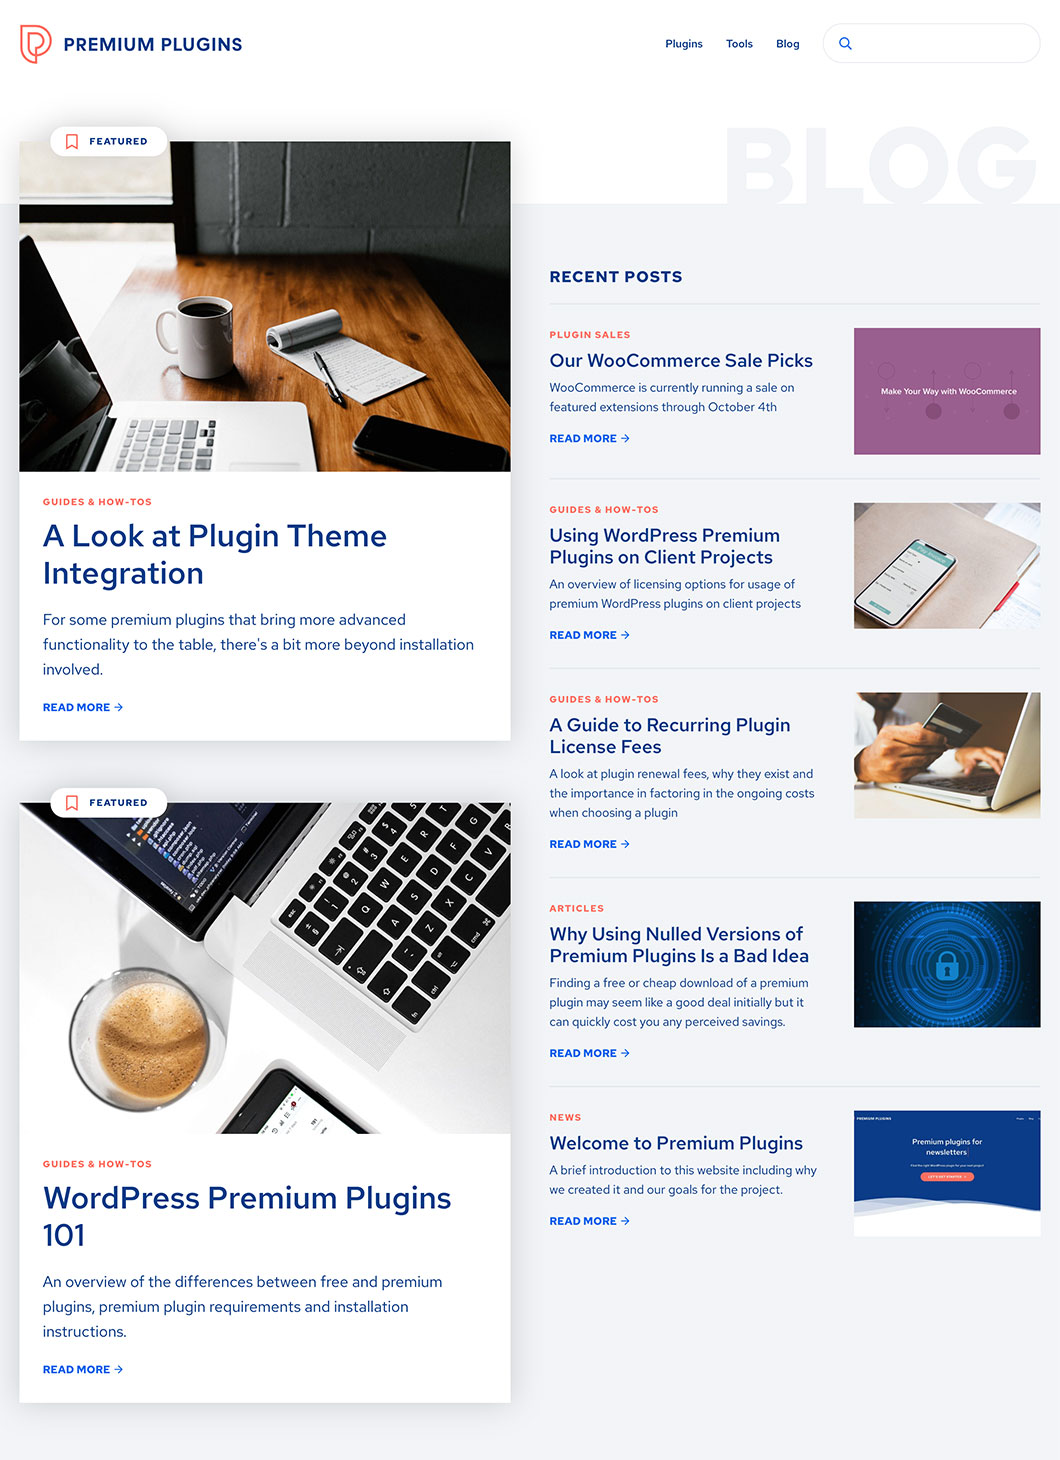 Screenshot of Premium Plugins Blog custom WordPress page